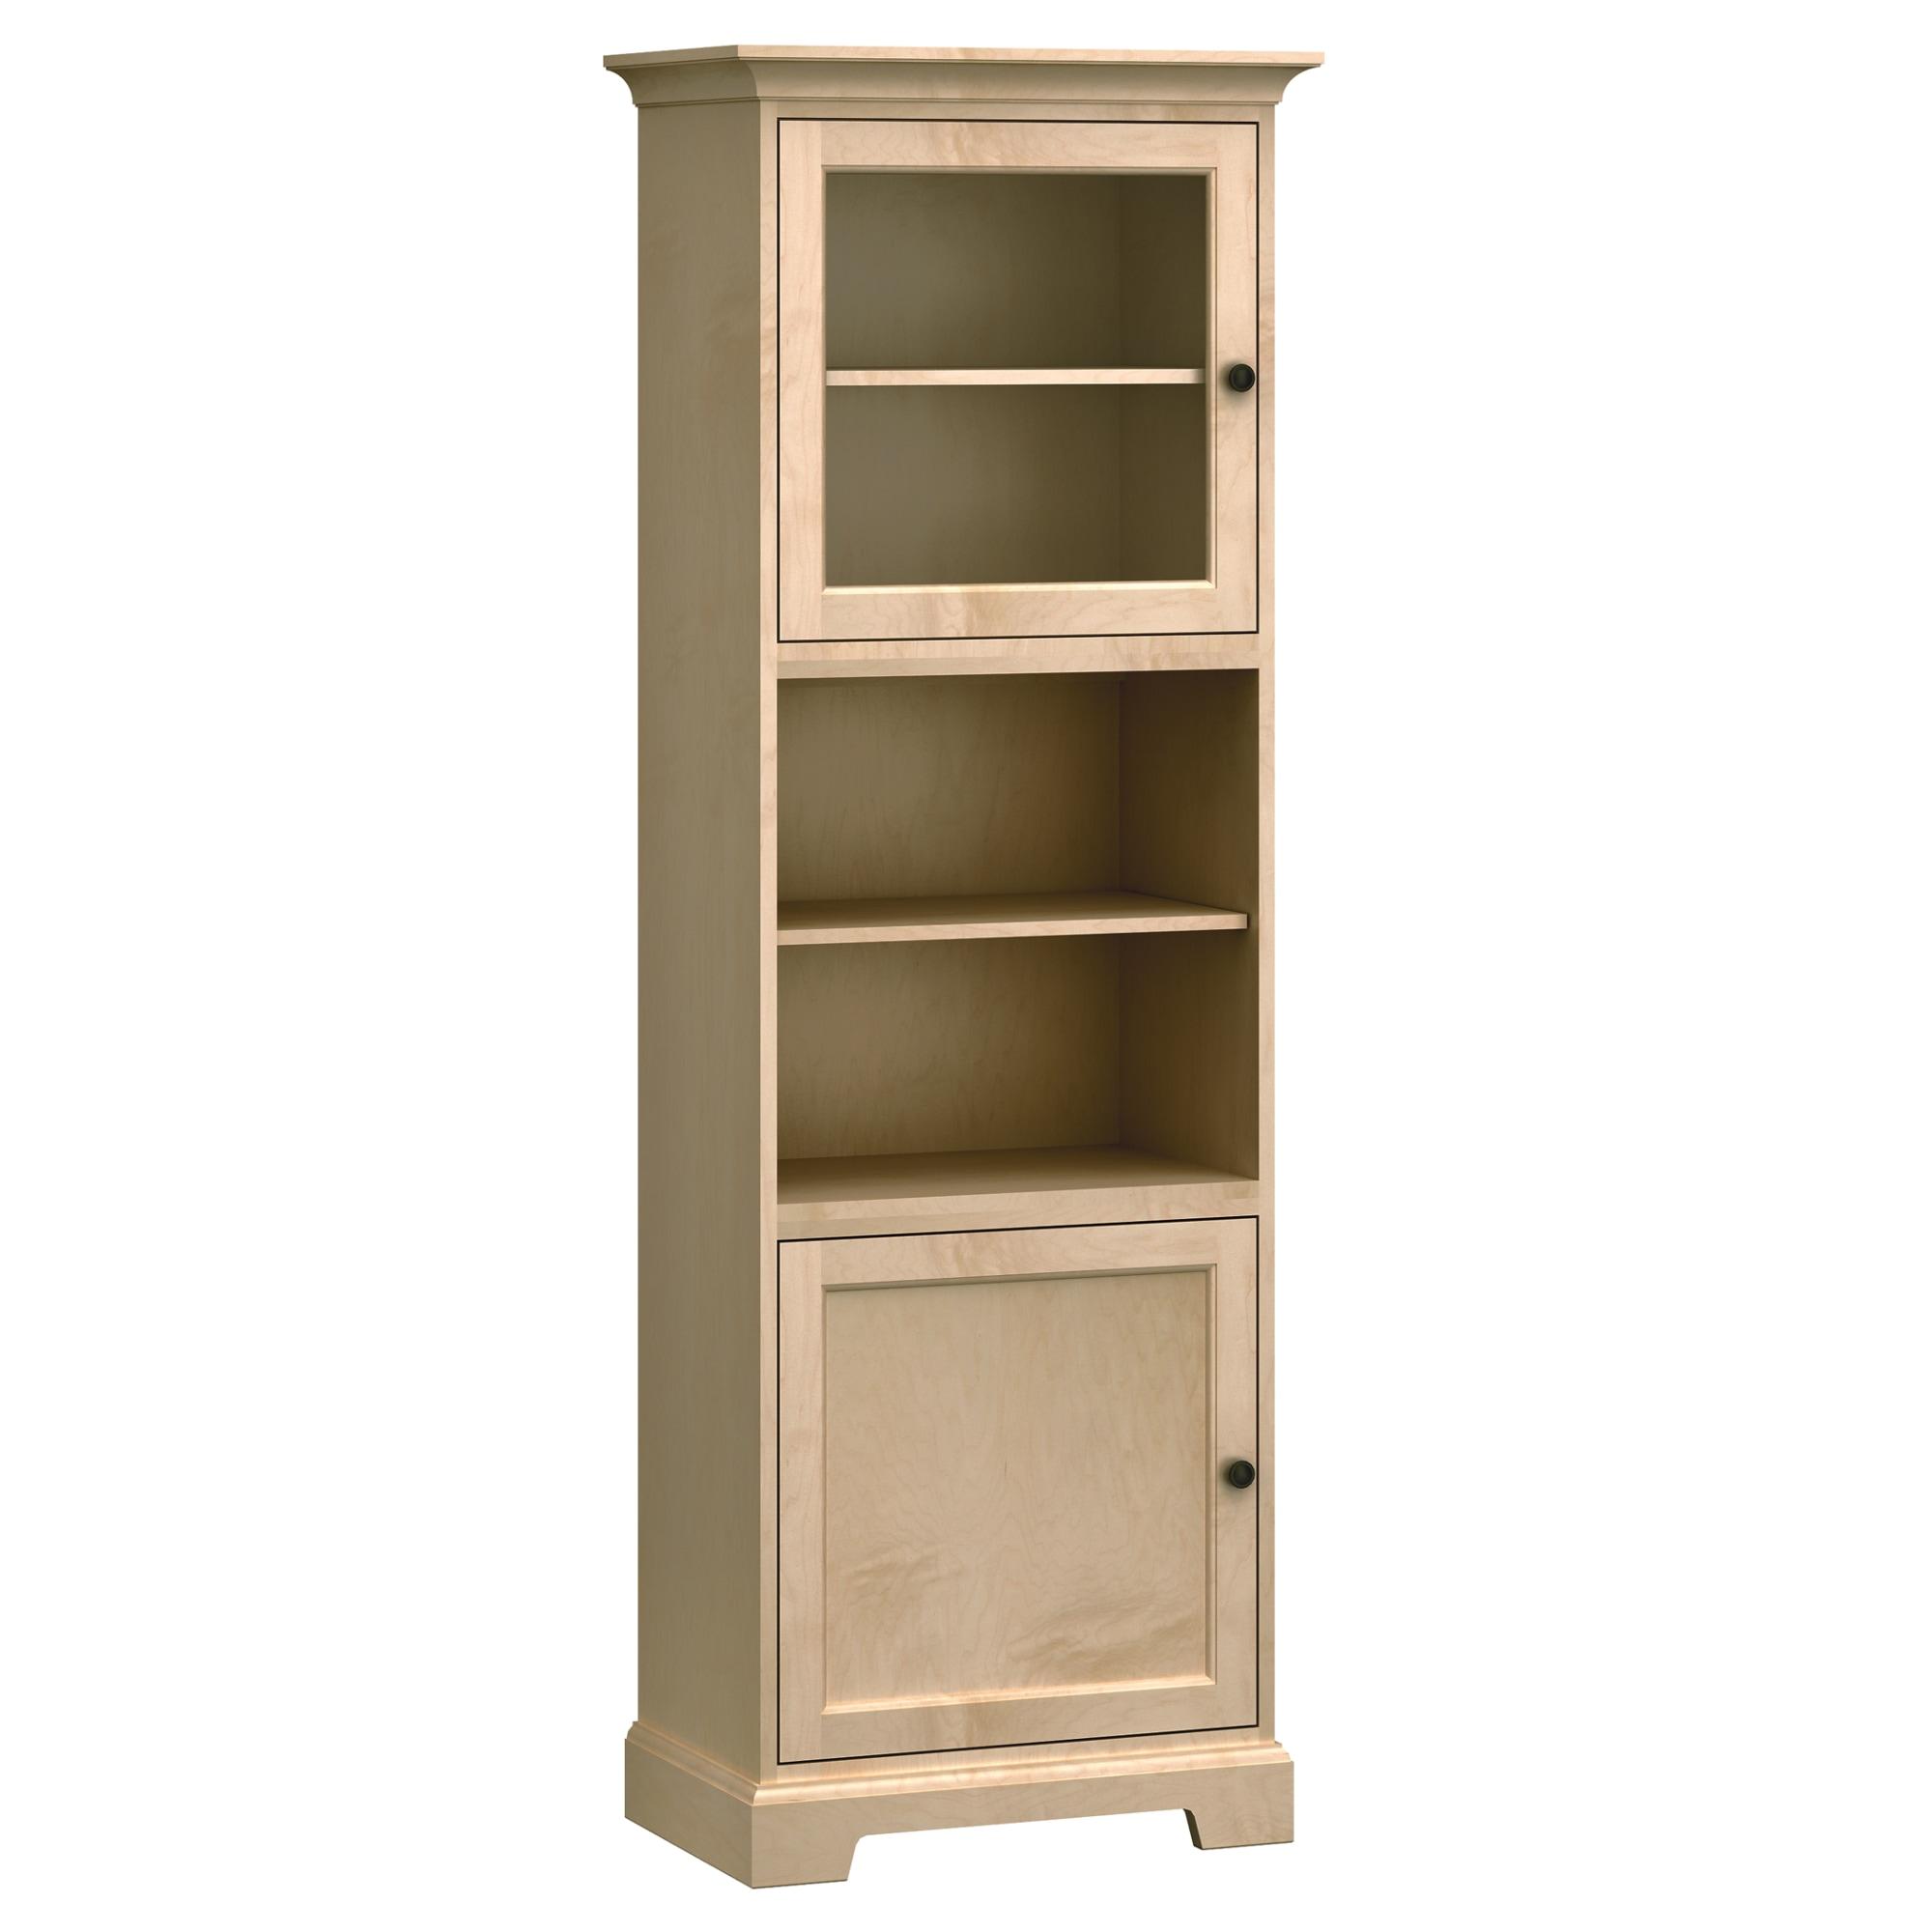 Image for HS27M Custom Home Storage Cabinet from Howard Miller Official Website